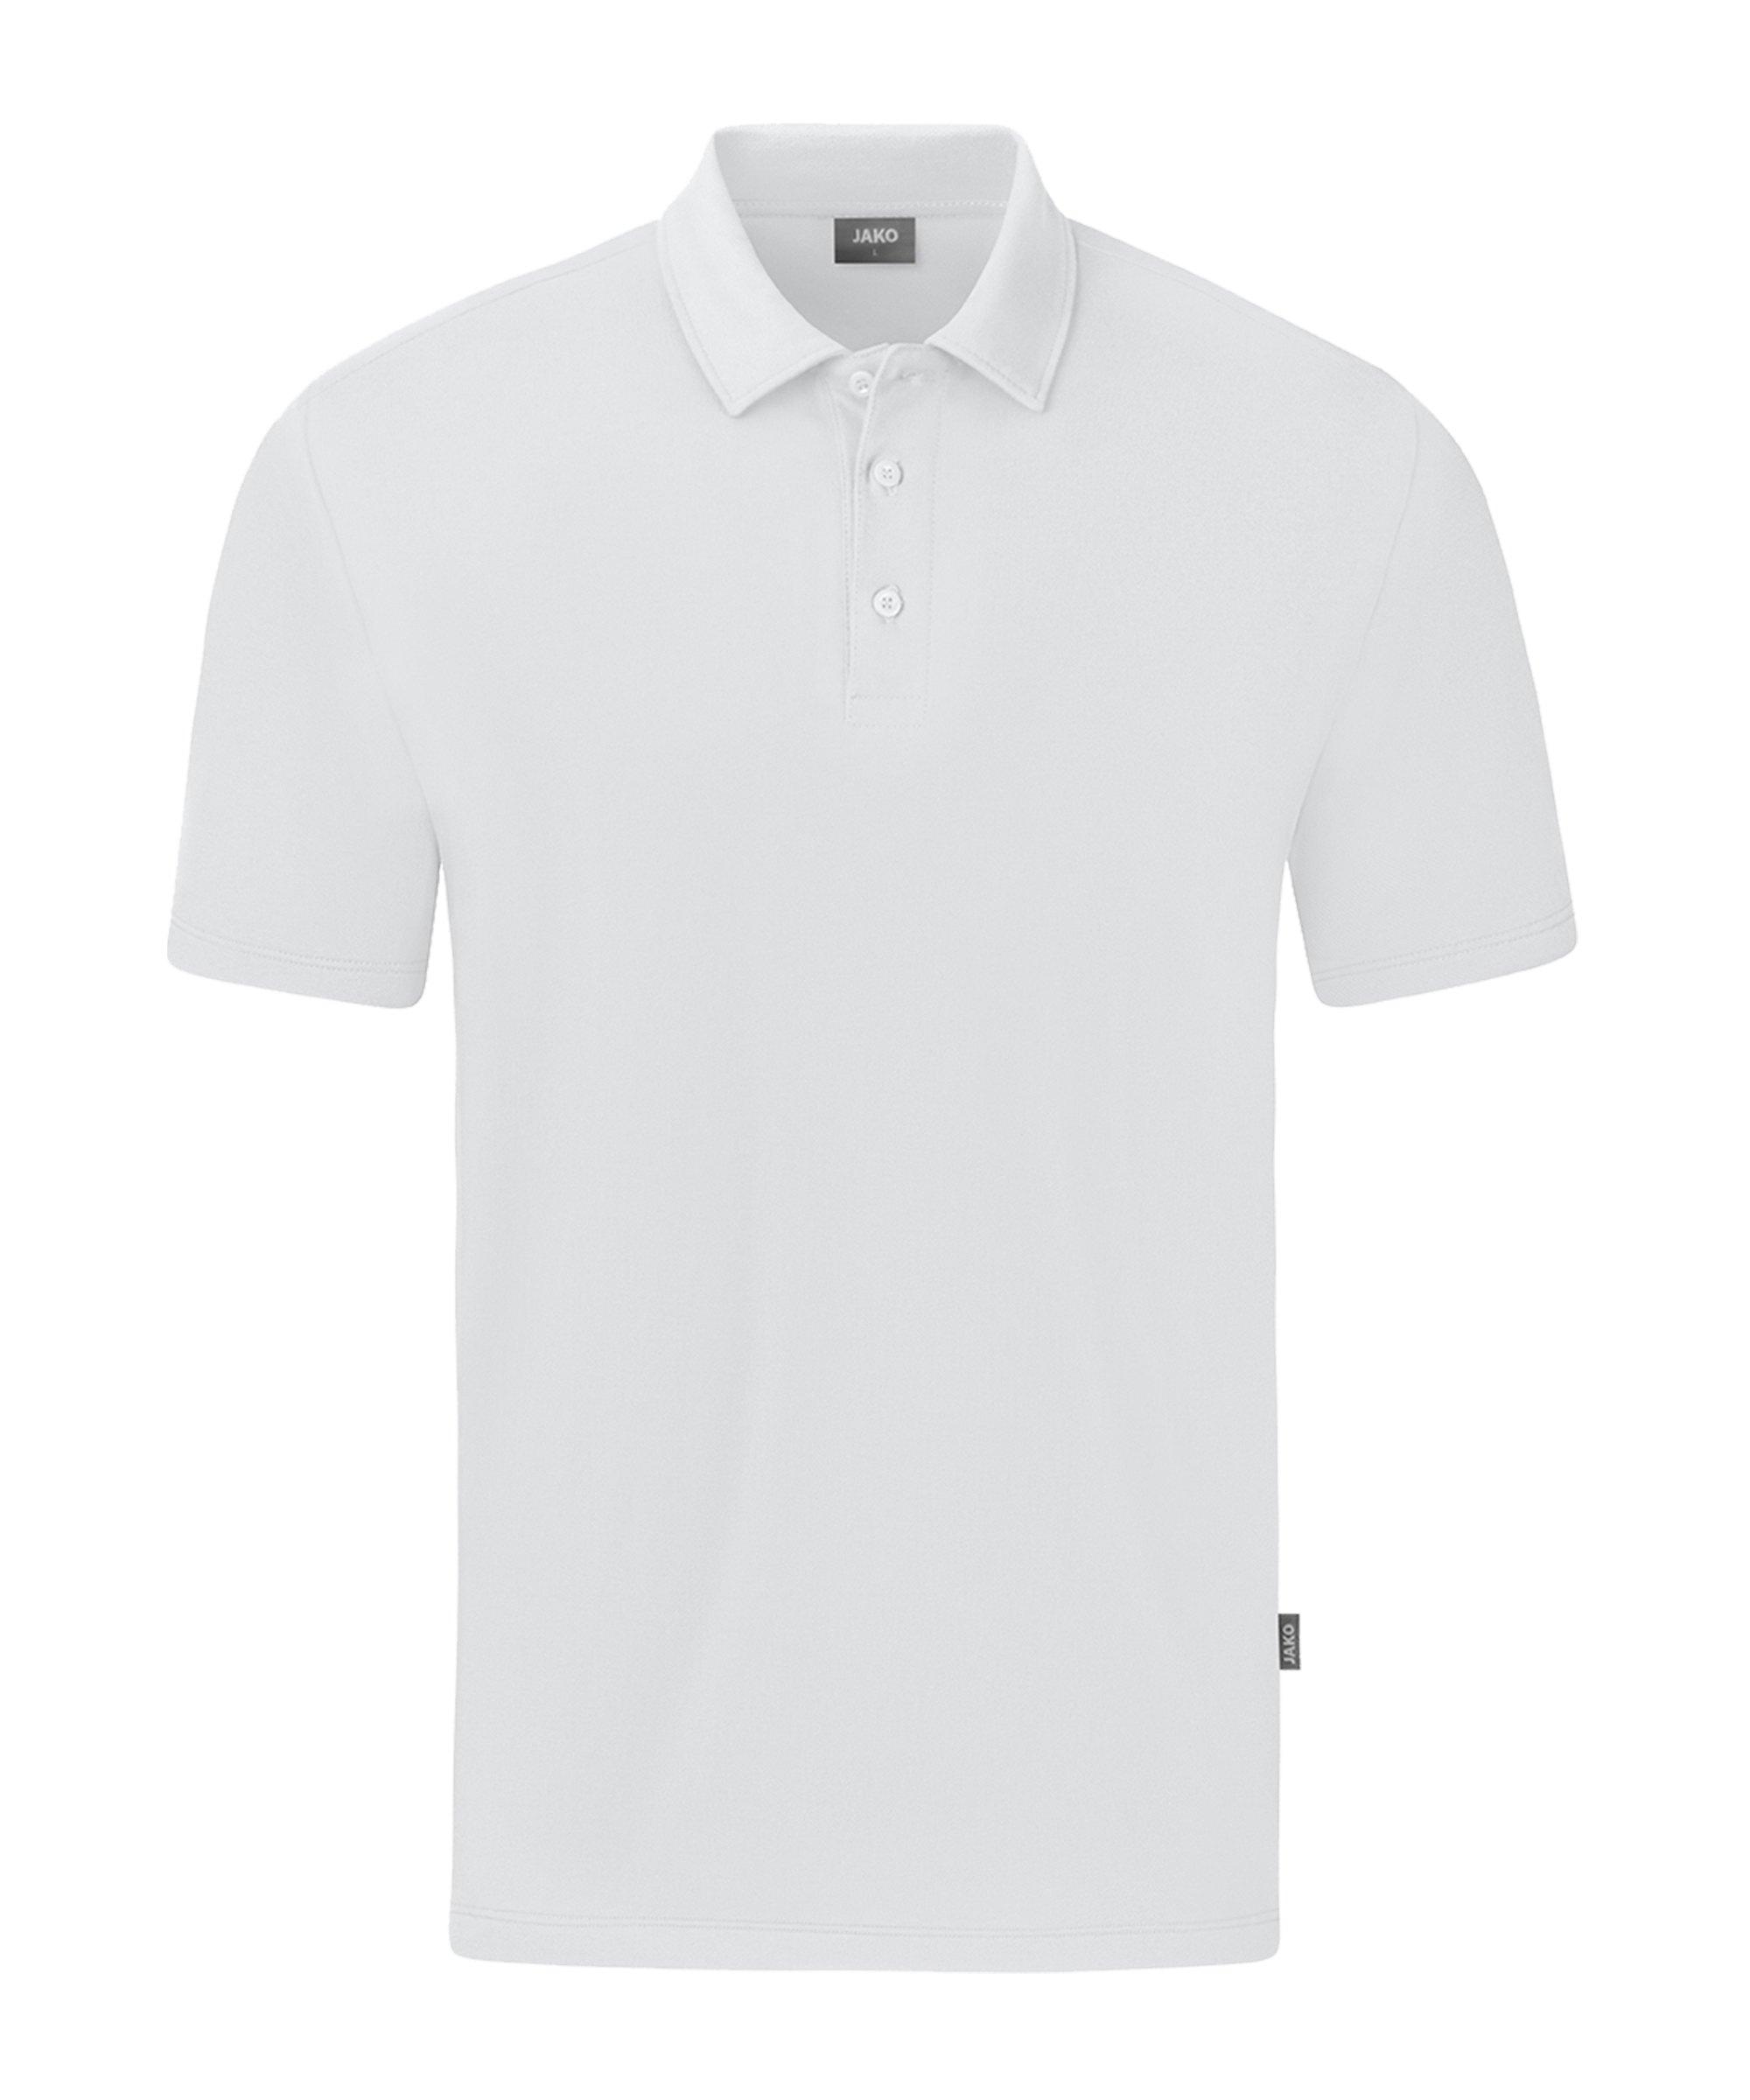 JAKO Organic Stretch Polo Shirt Weiss F000 - weiss